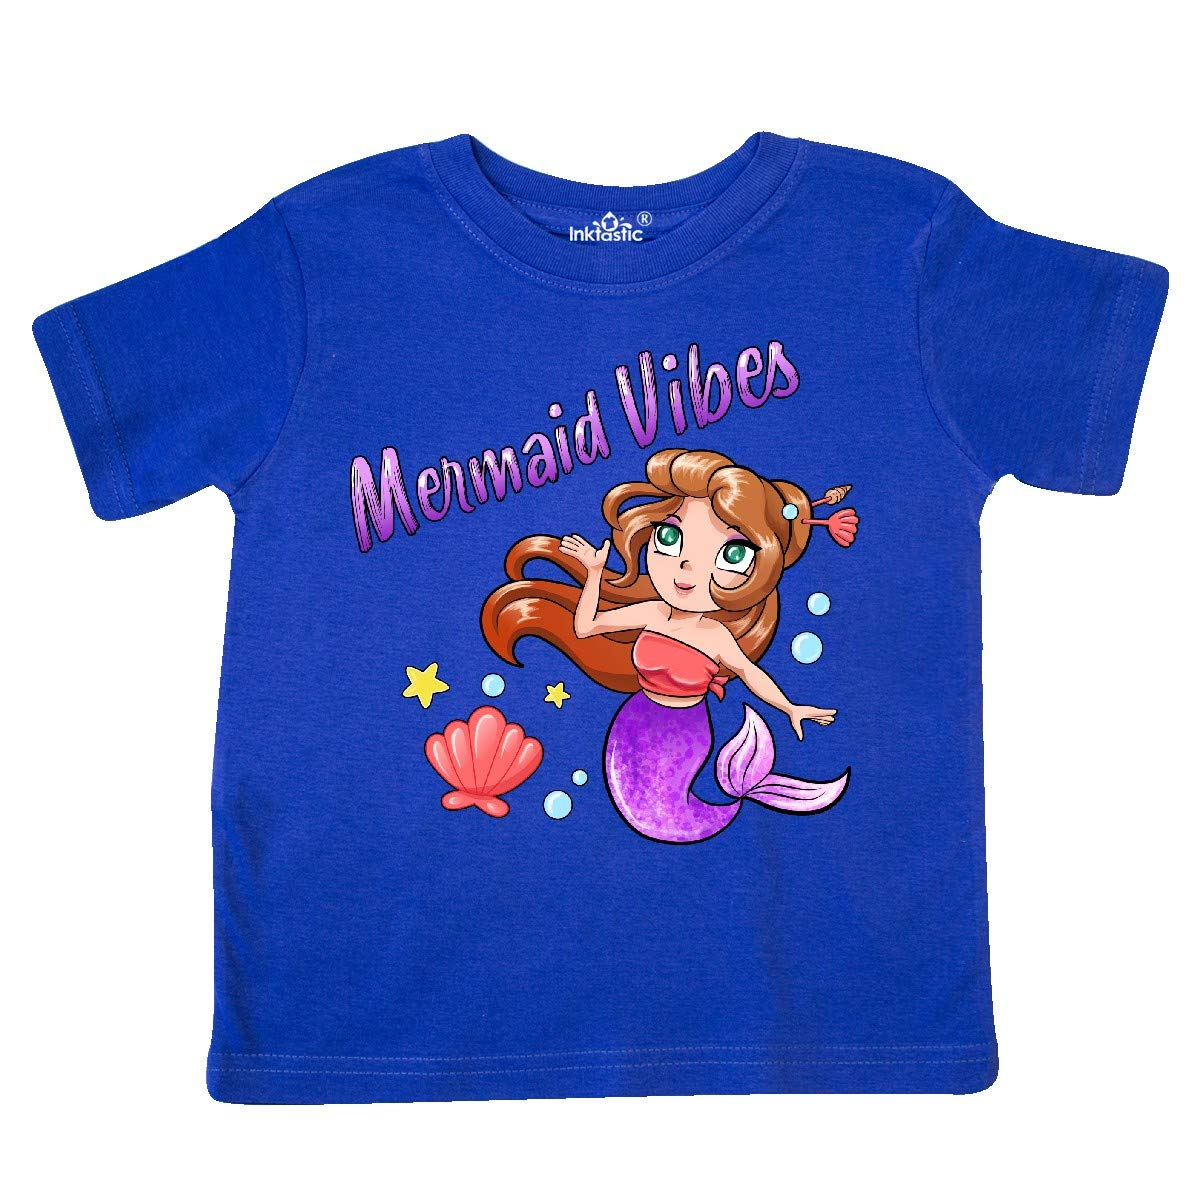 inktastic Mermaid Vibes Cute Mermaid with Purple Tail Toddler T-Shirt